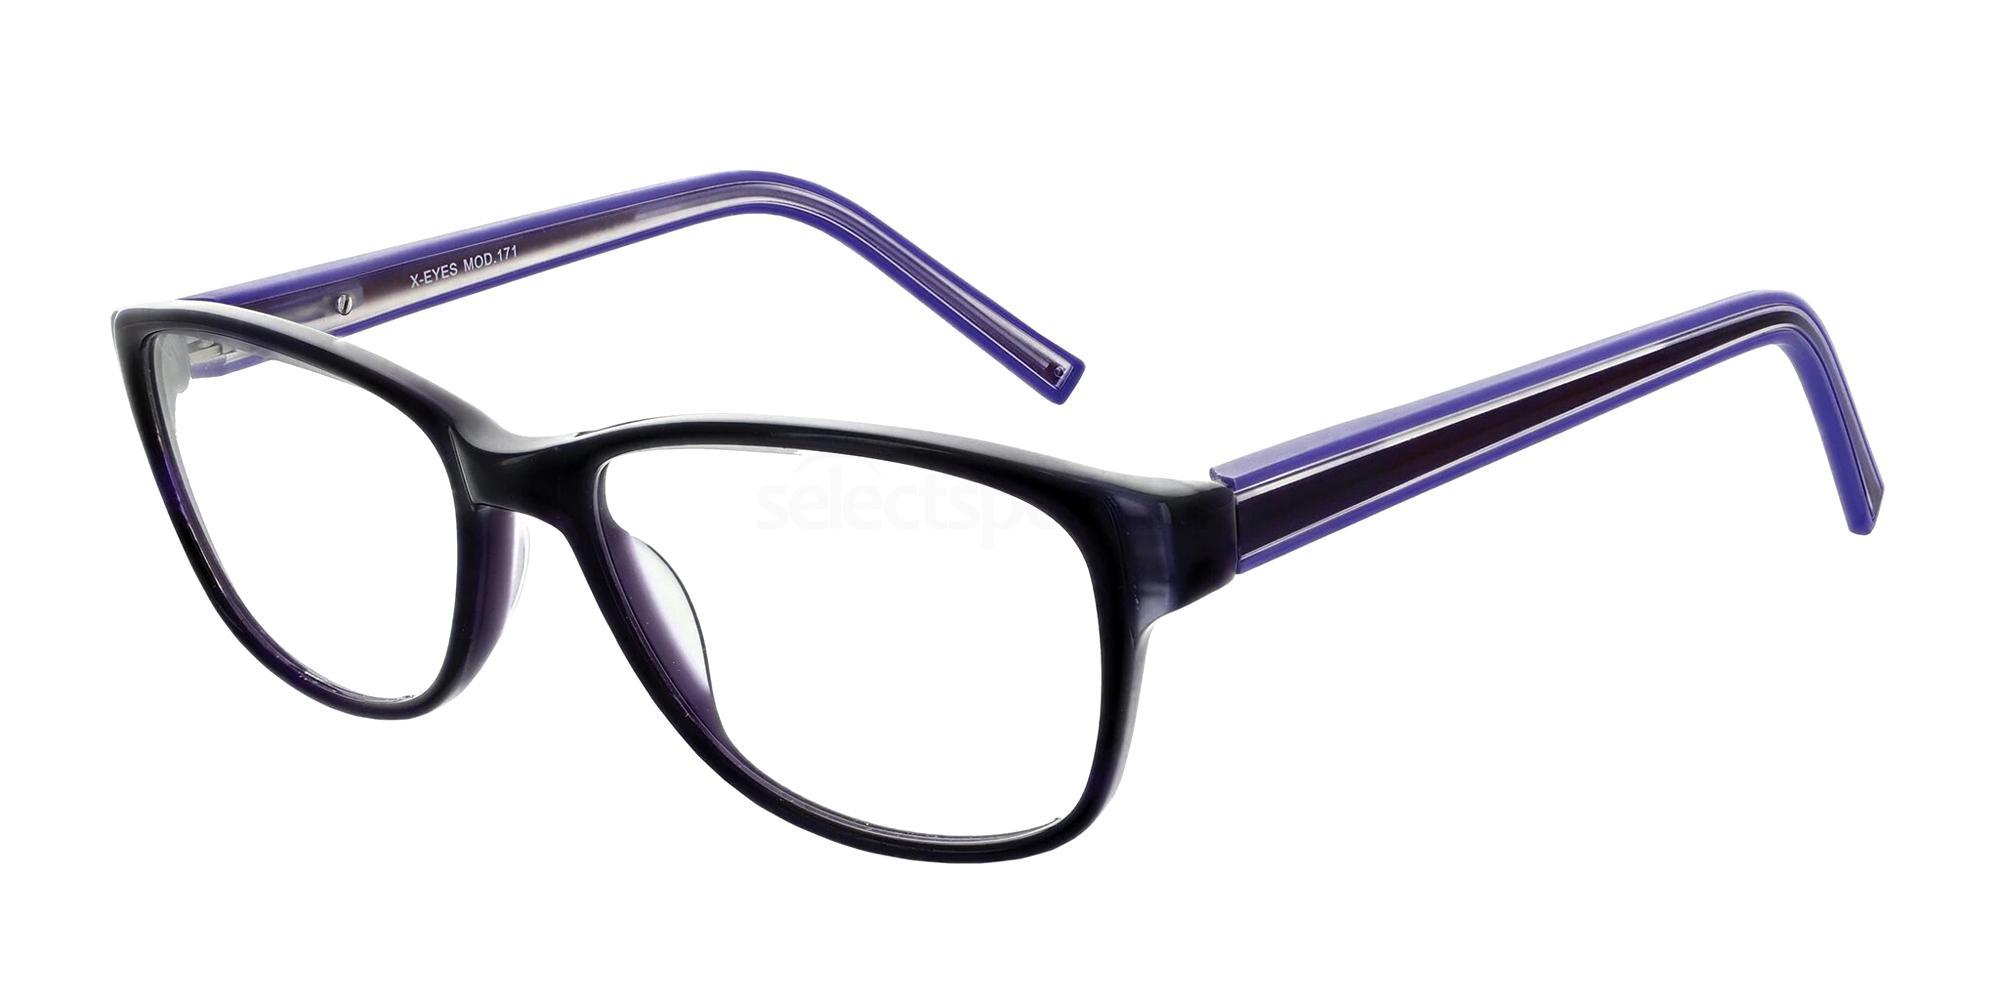 Purple 171 Glasses, X-Eyes